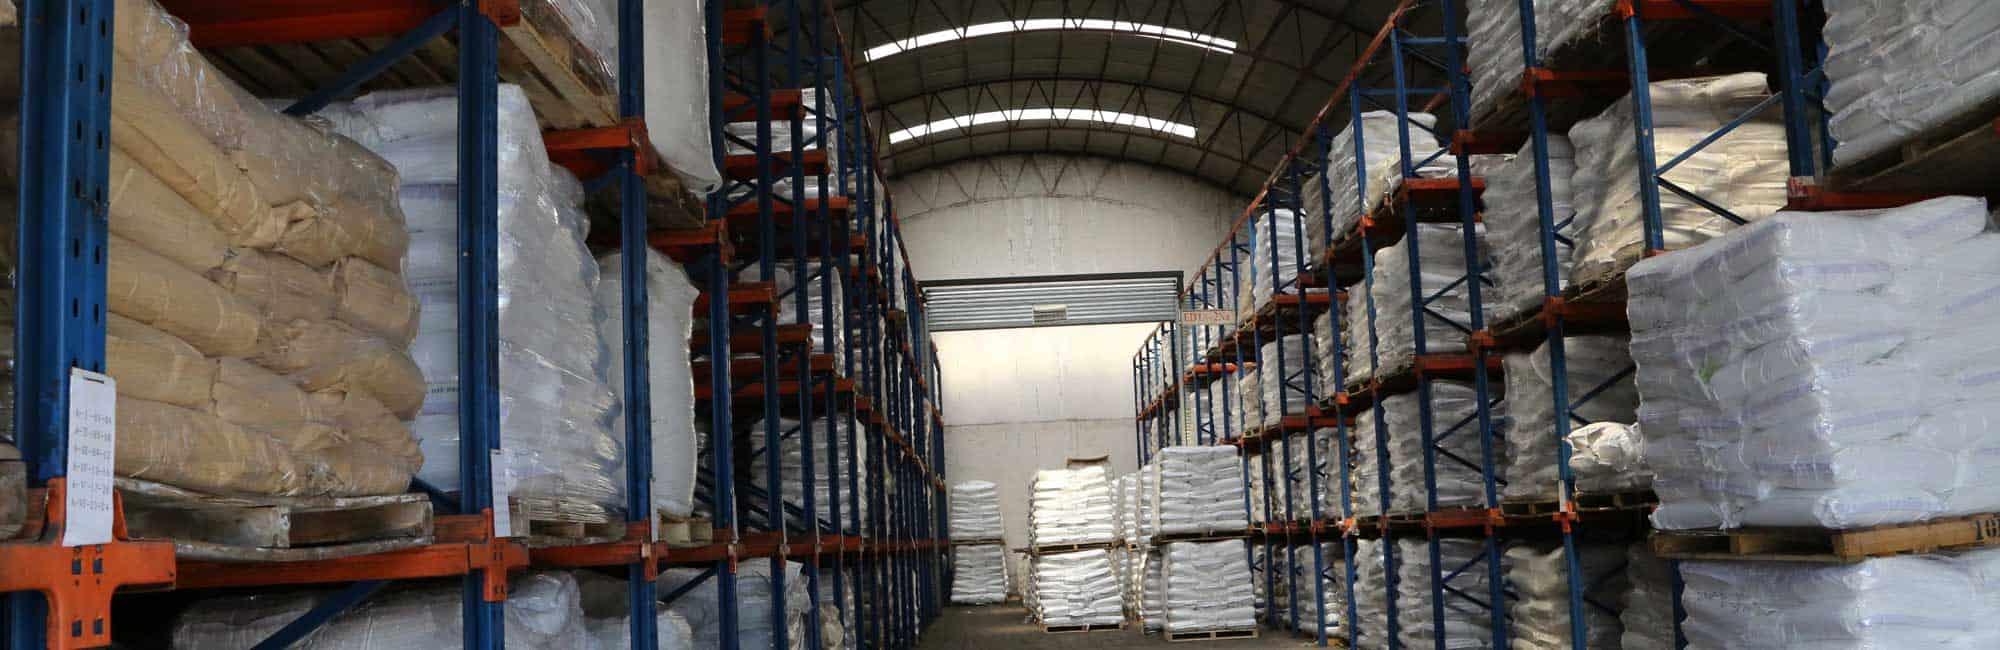 zhonglan industry warehouse